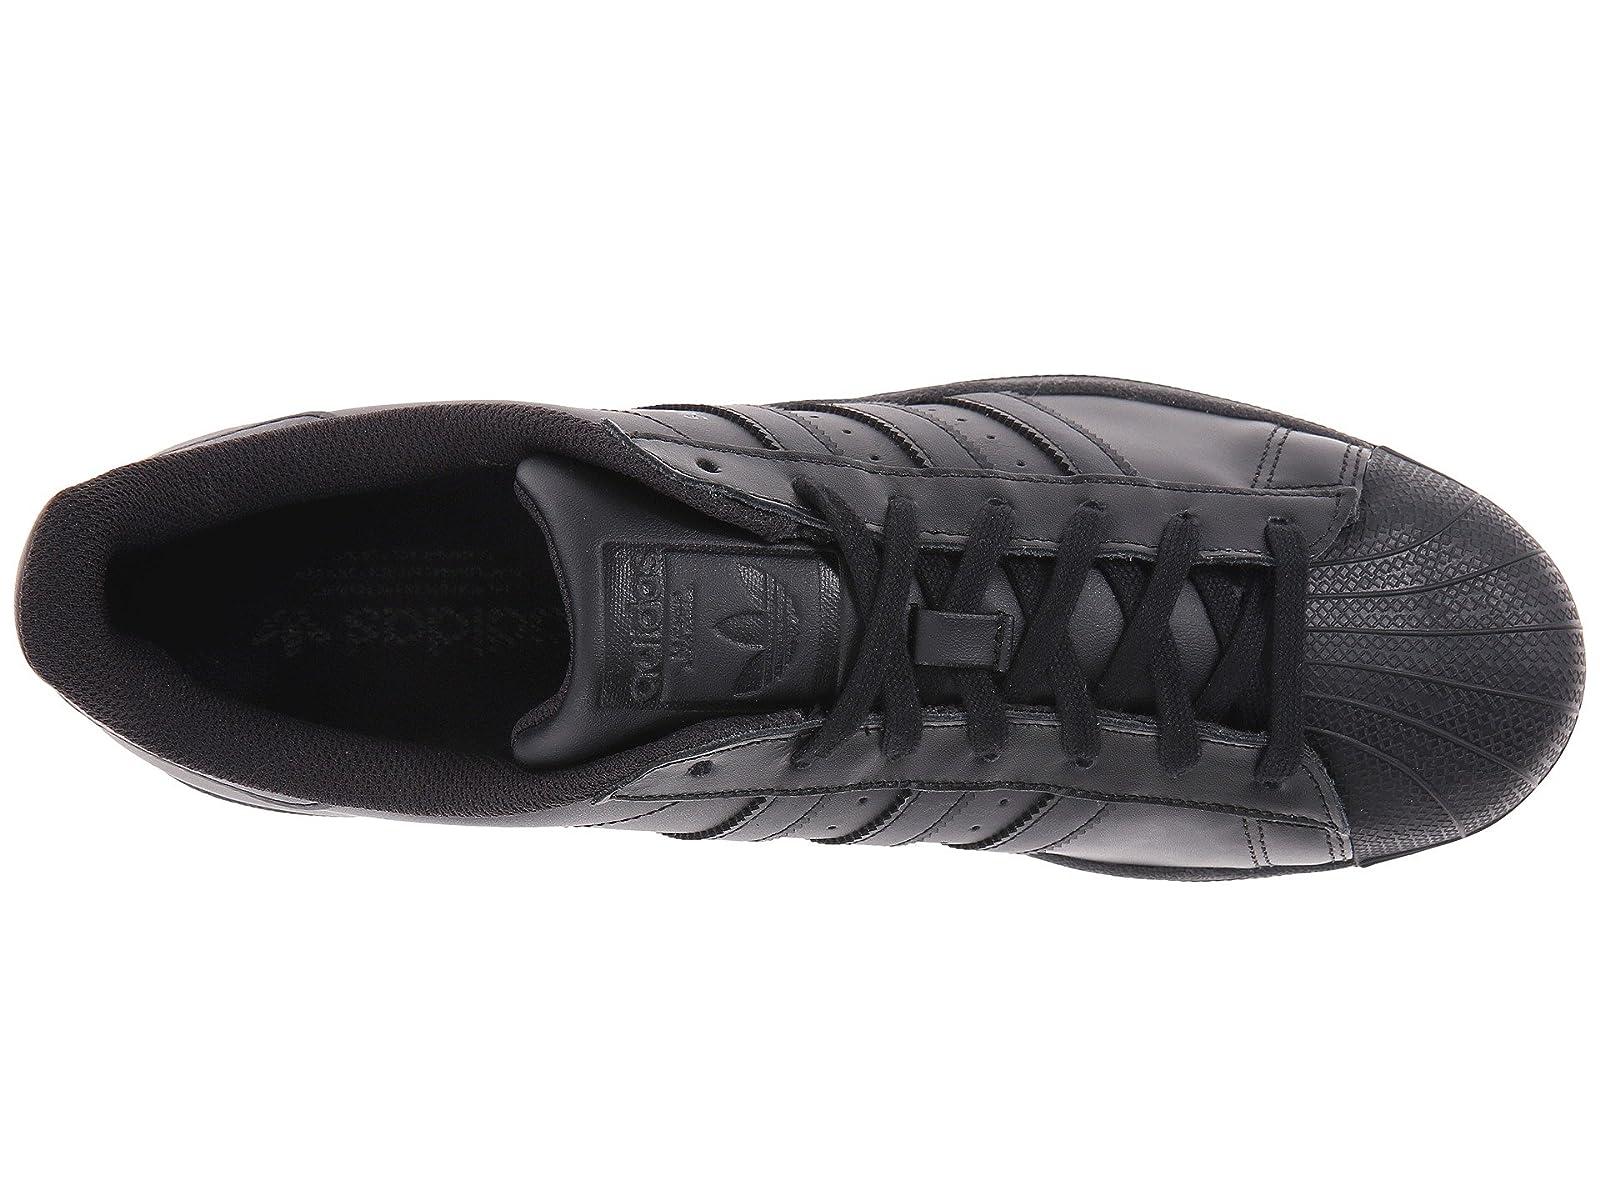 Mens adidas Superstar Originals D70171 Snakeskin White